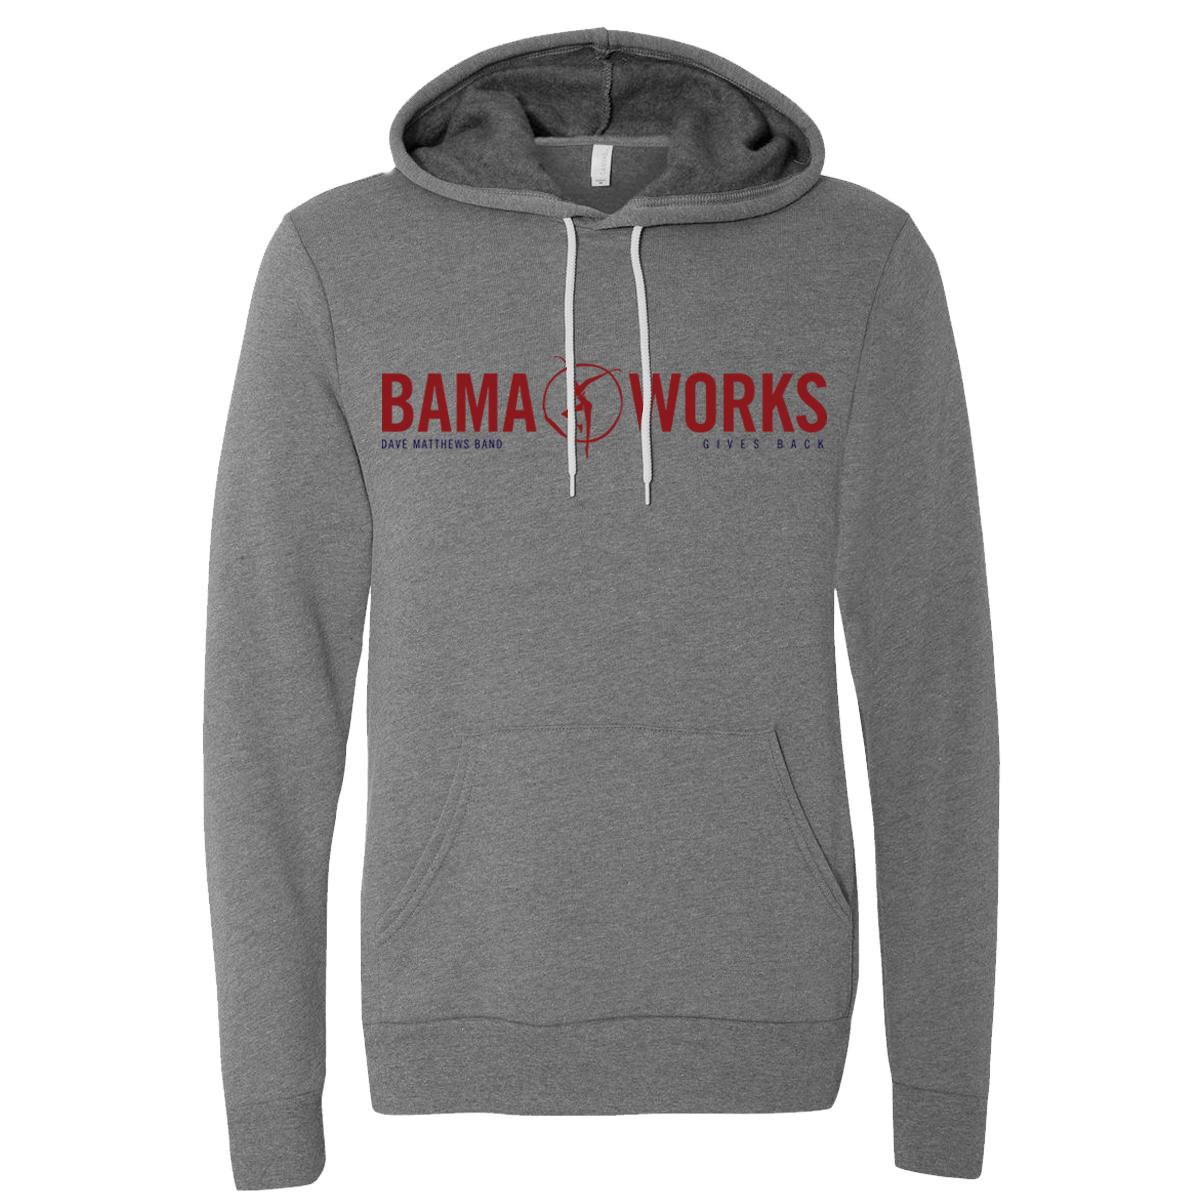 BAMAworks Hoodie